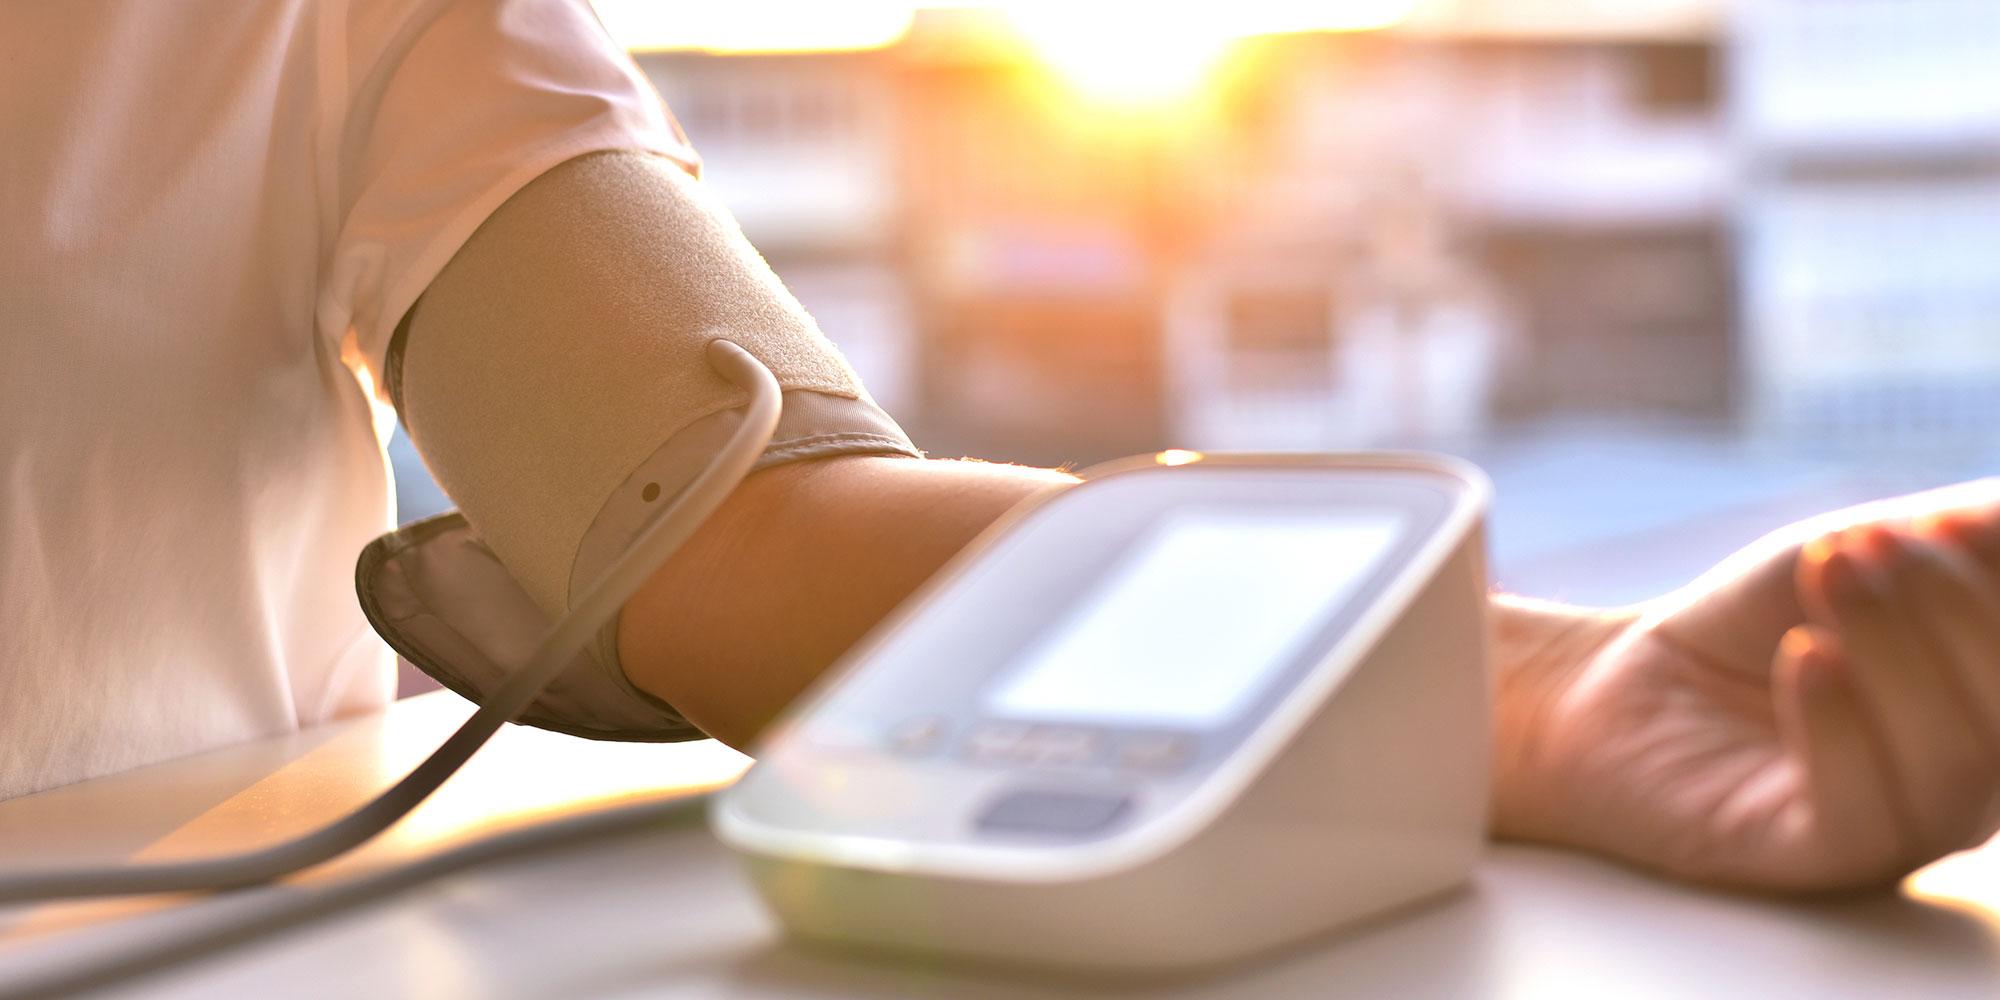 High blood pressure isn't caused by salt